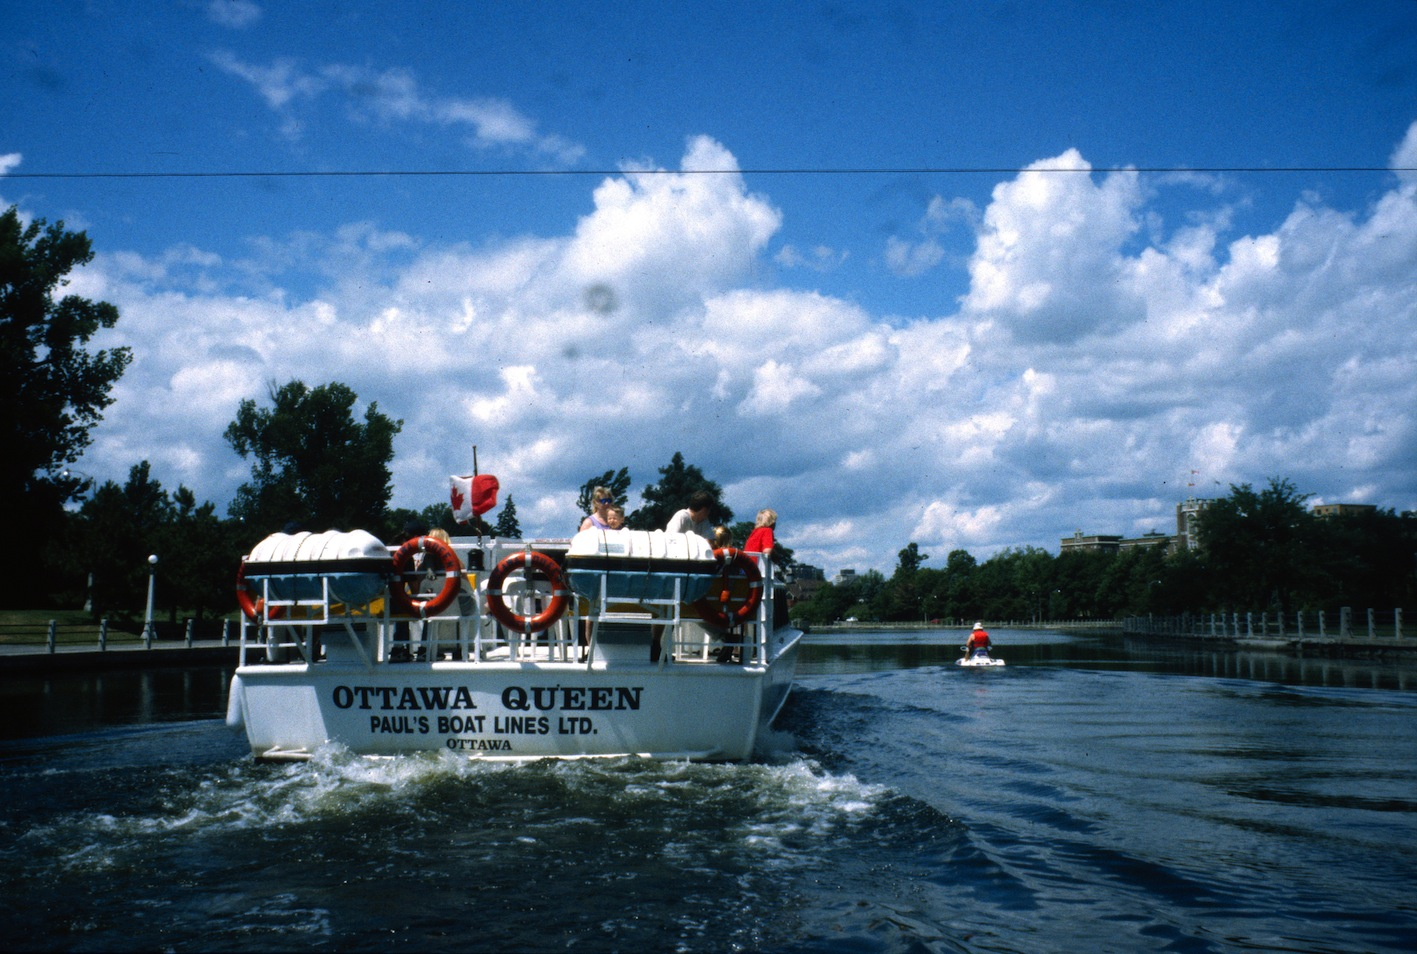 Cruise boat near Dow's Lake on the Rideau Canal Sea Doo Tour